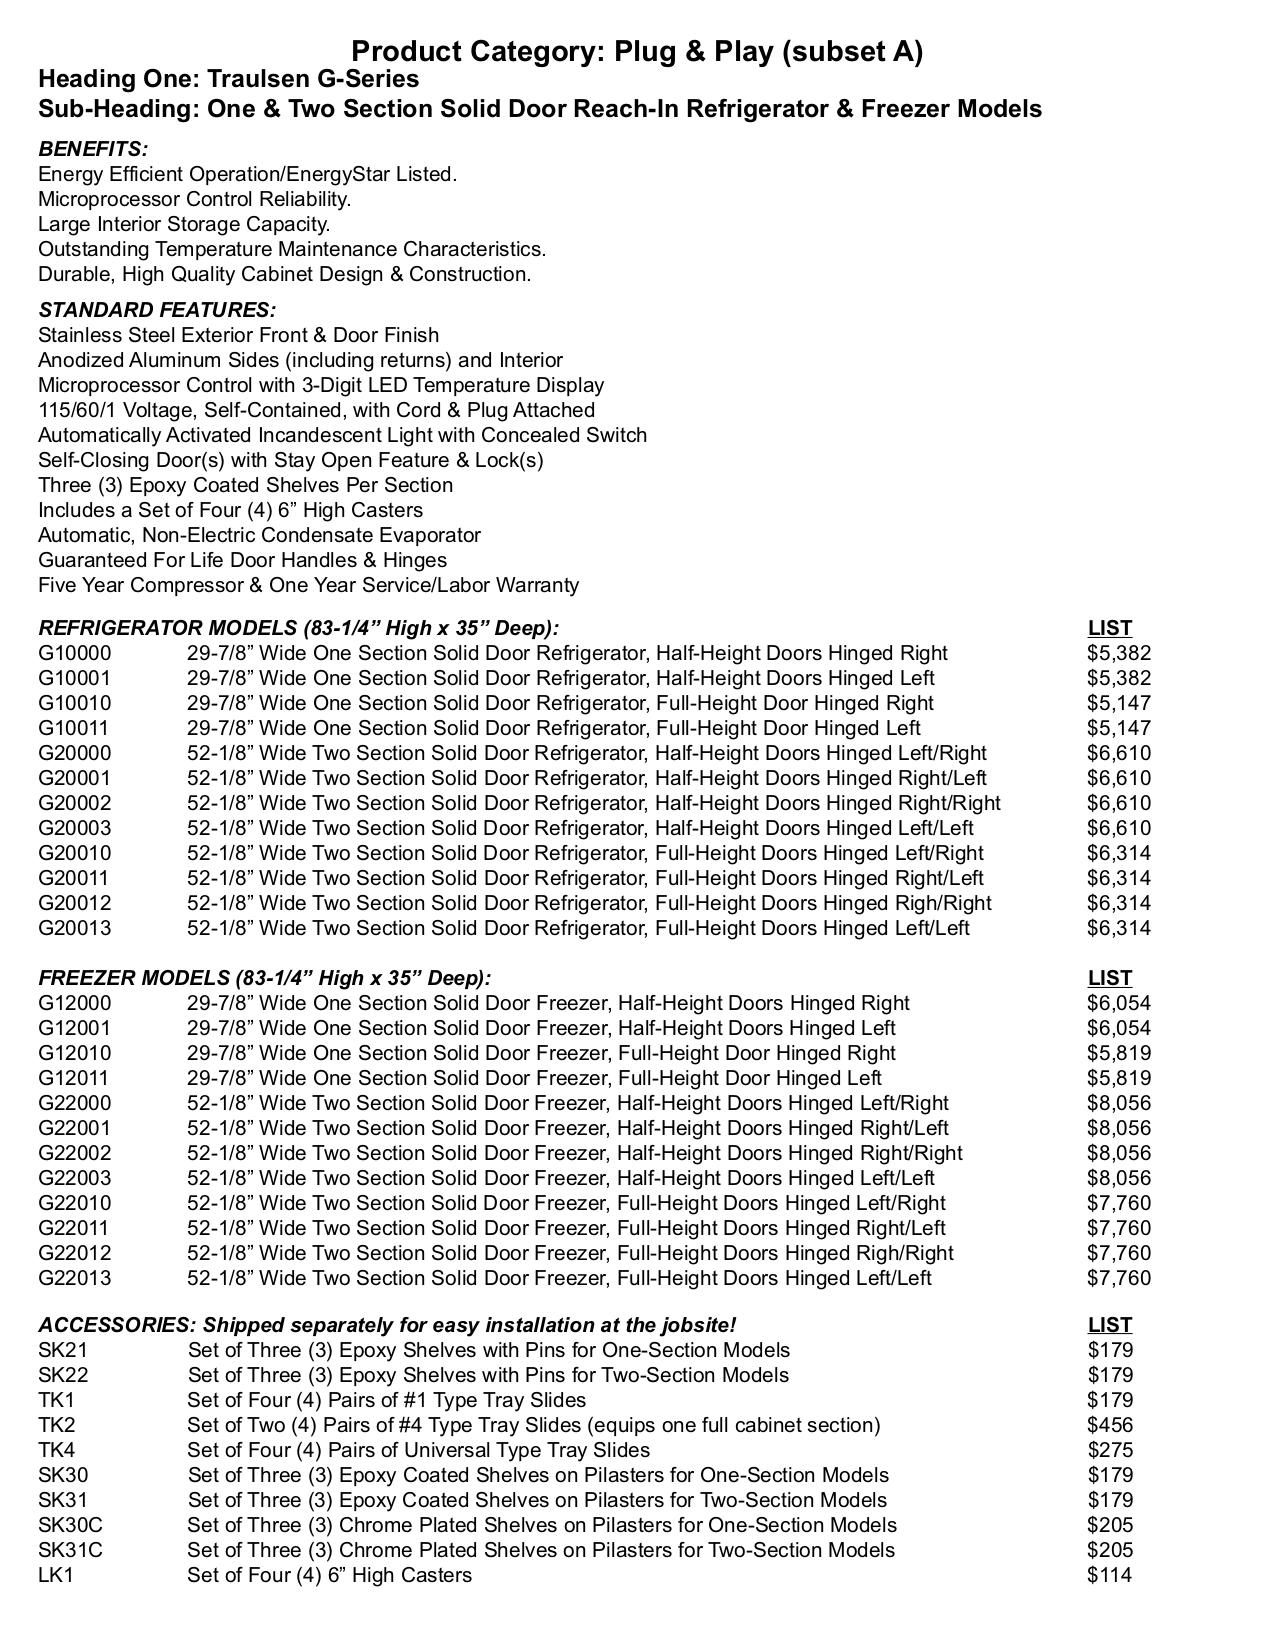 Traulsen G31010 Wiring Diagram Model | Wiring Library